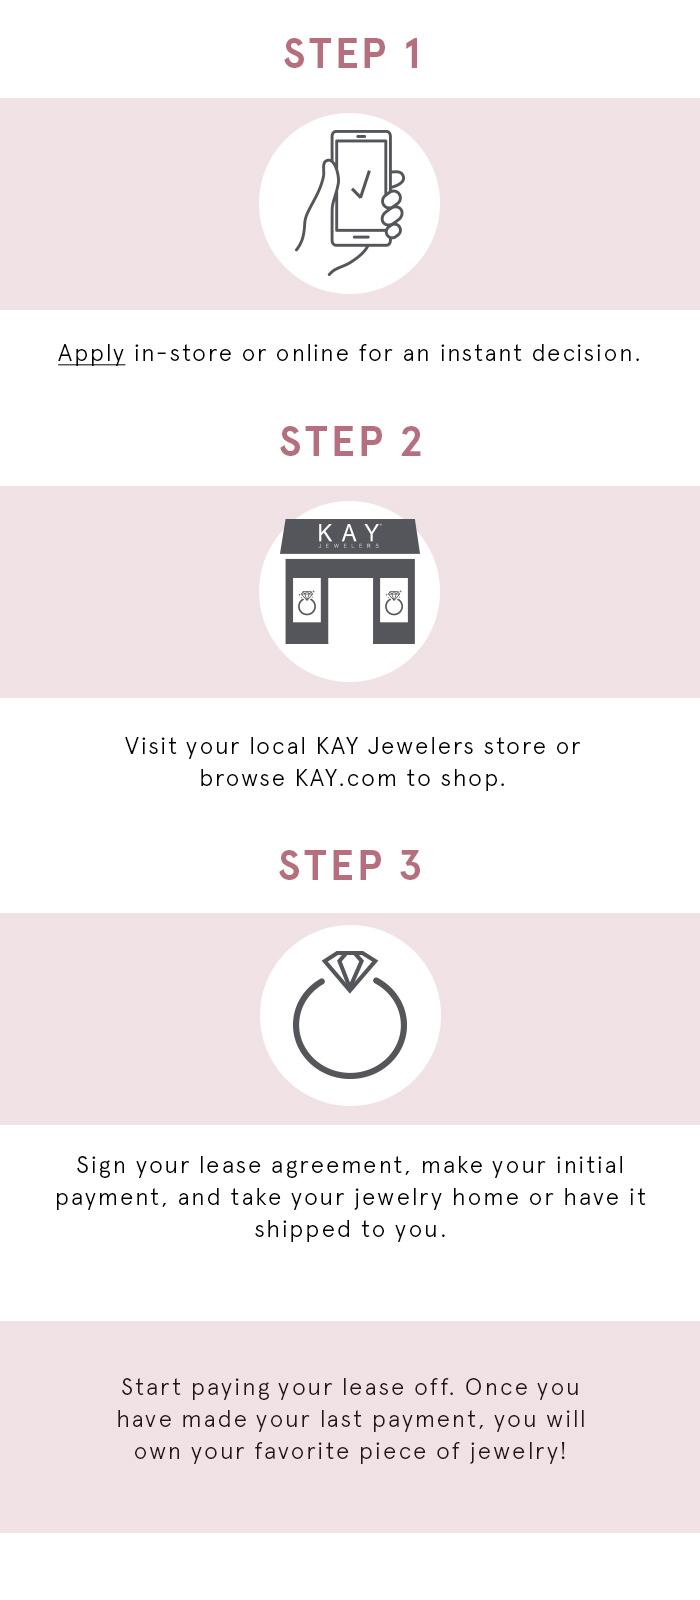 Kays Jewelry No Credit Check - Jewelry Ufafokus.com